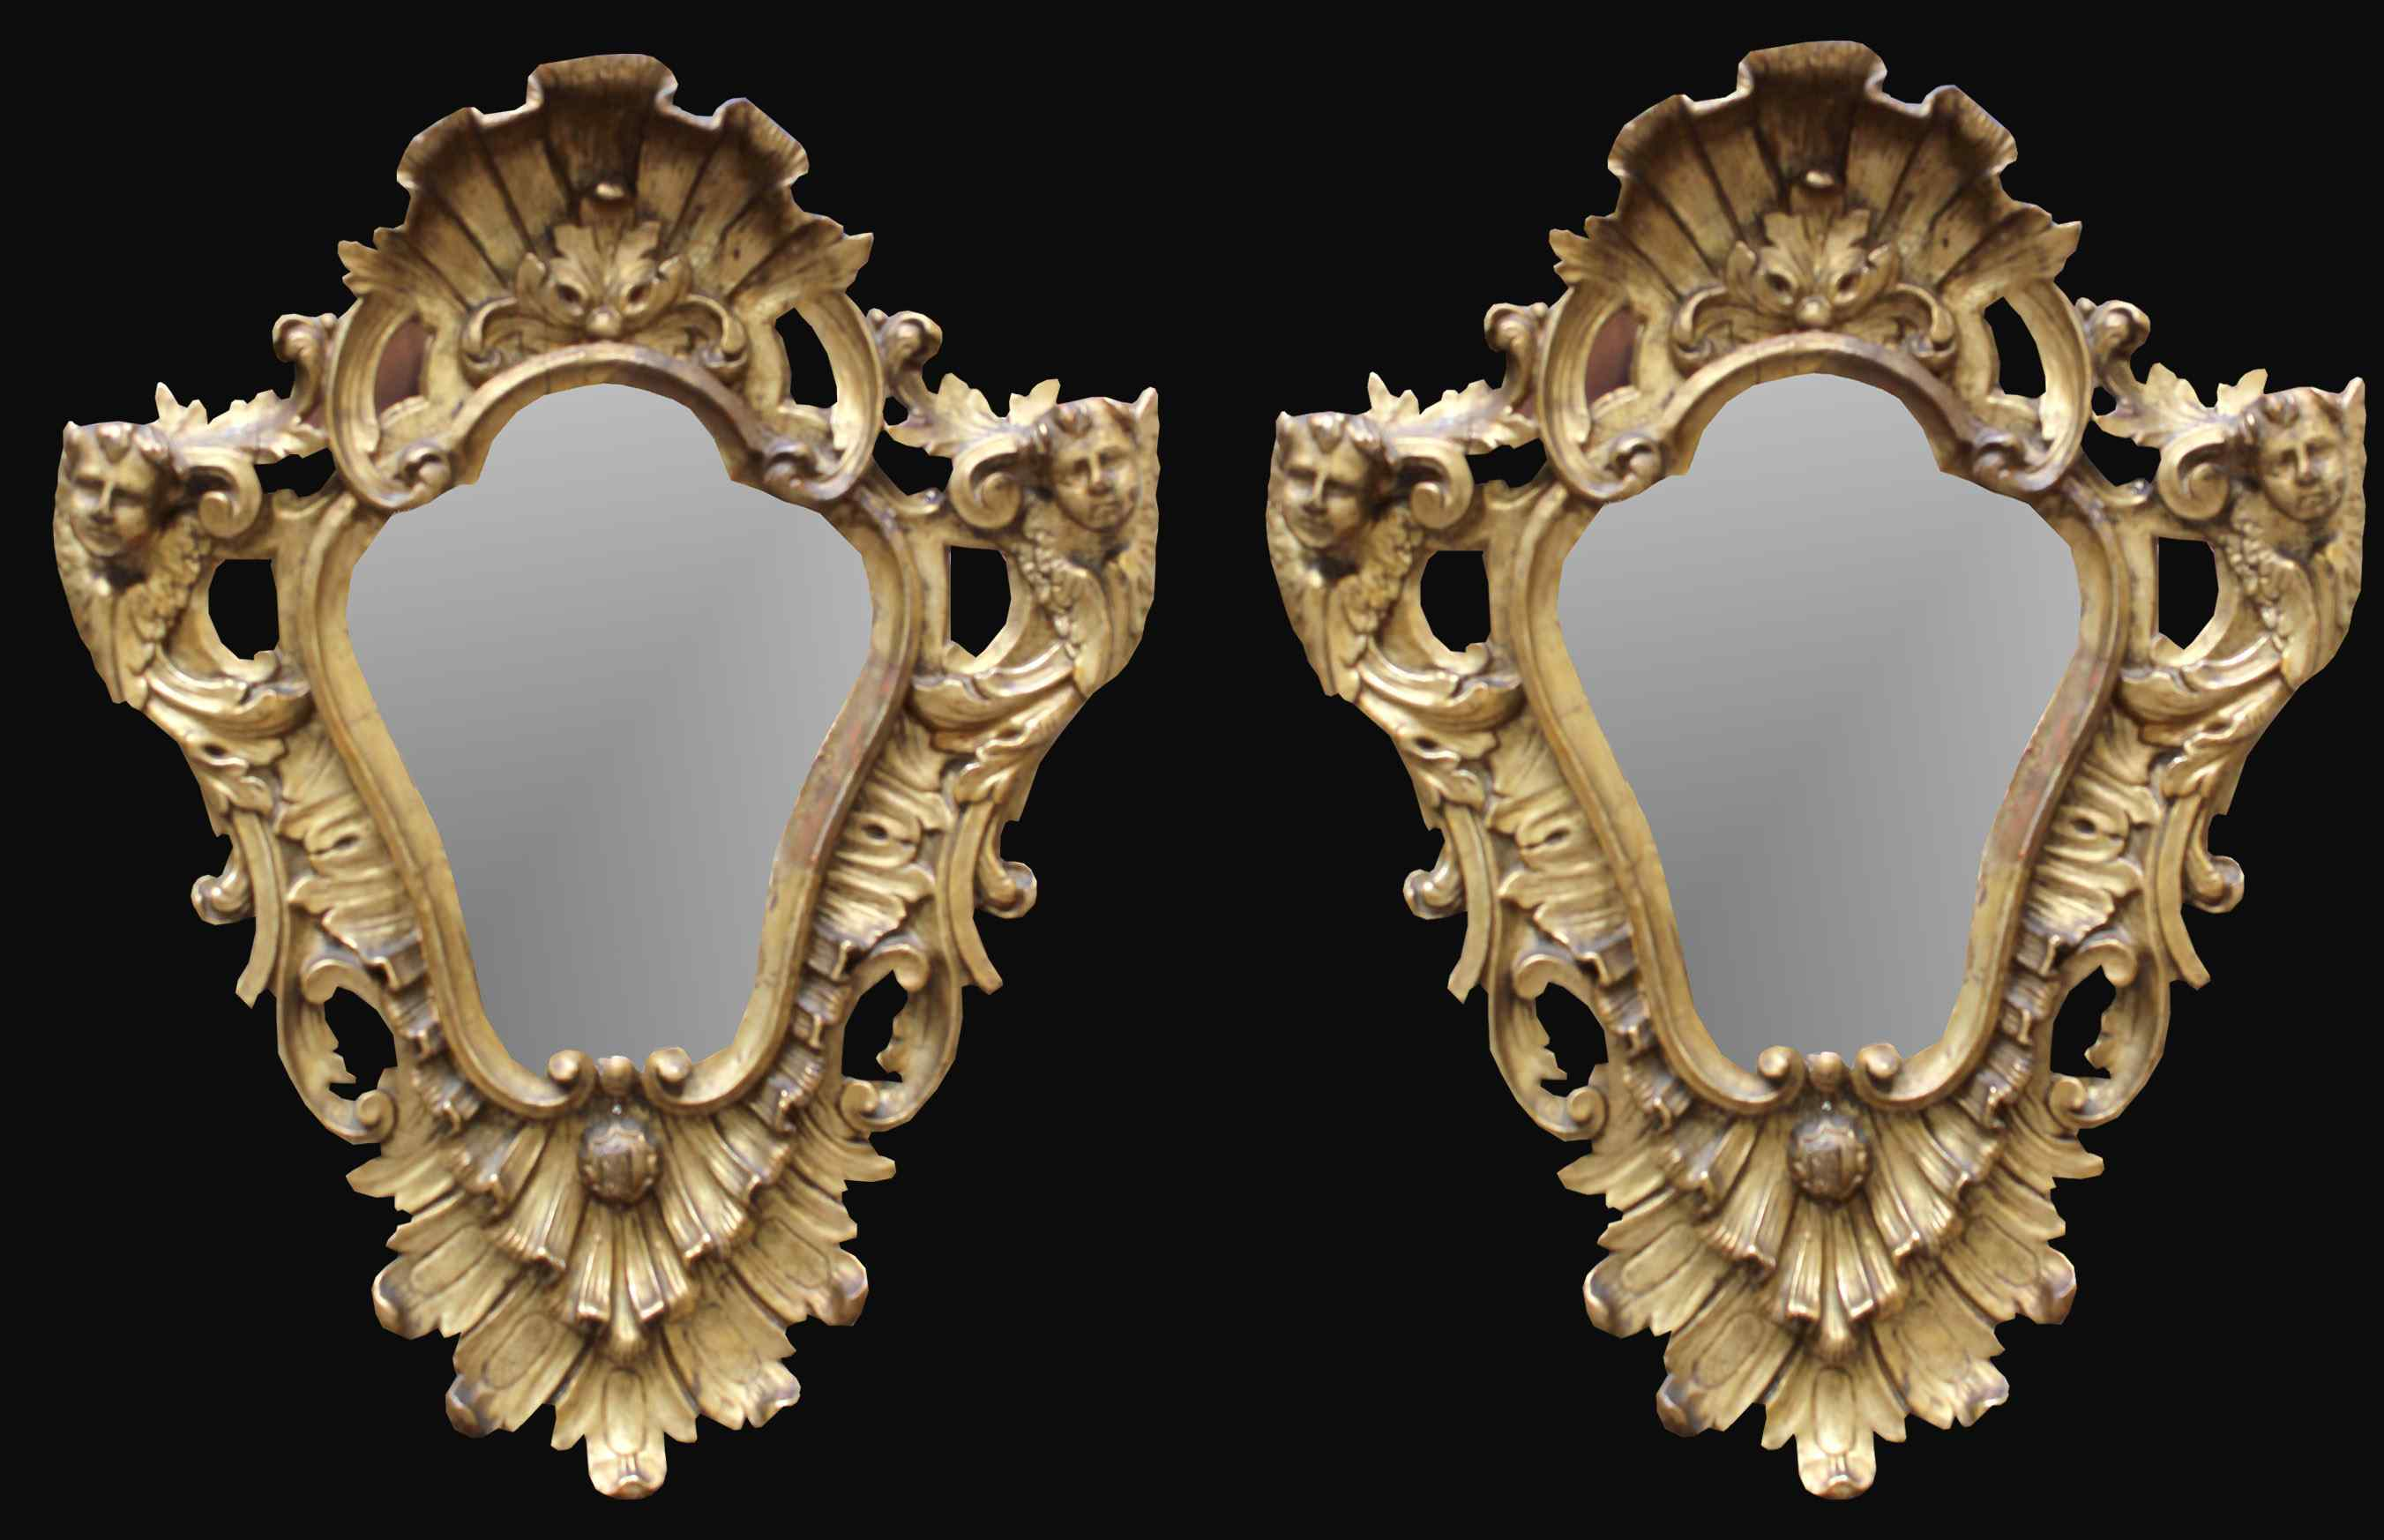 XVIII siècle et miroirs Couple